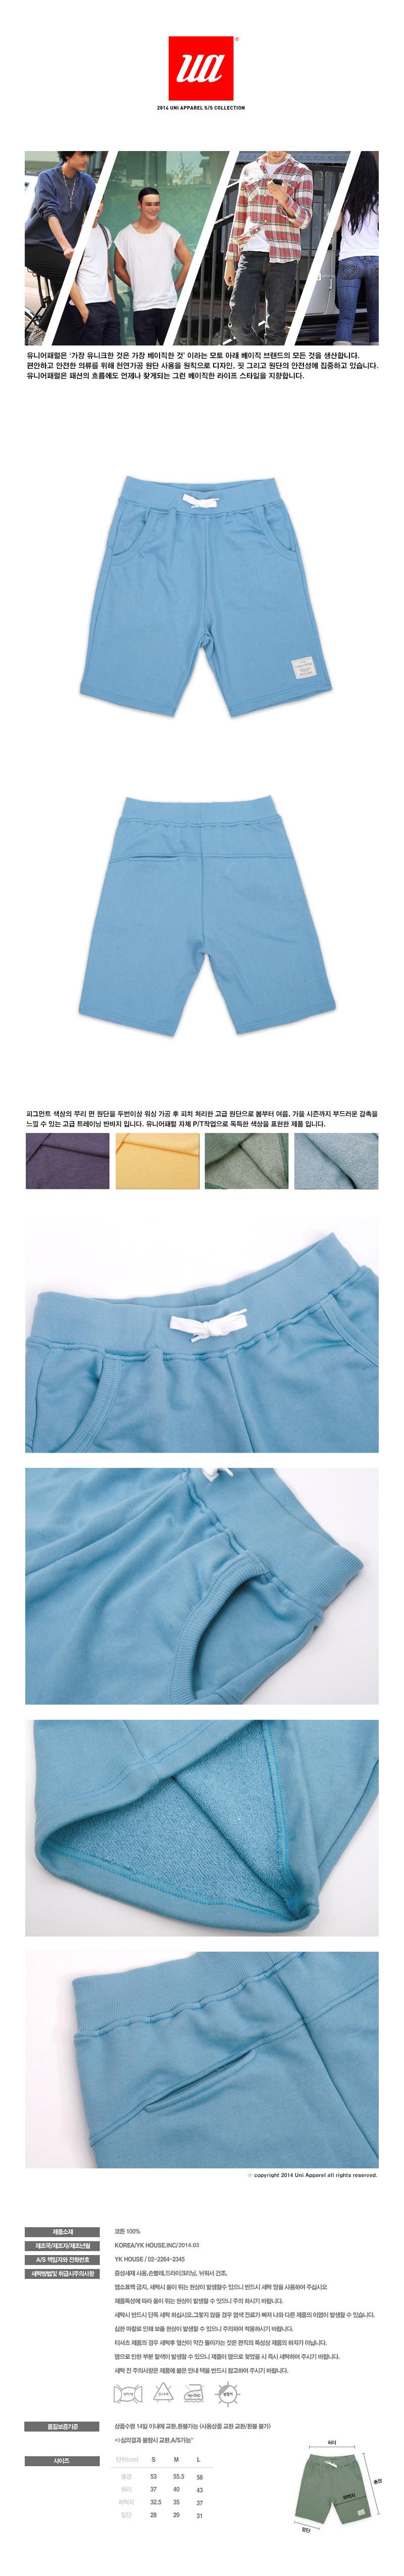 basic-pigment-short-pants-(skyblue).jpg